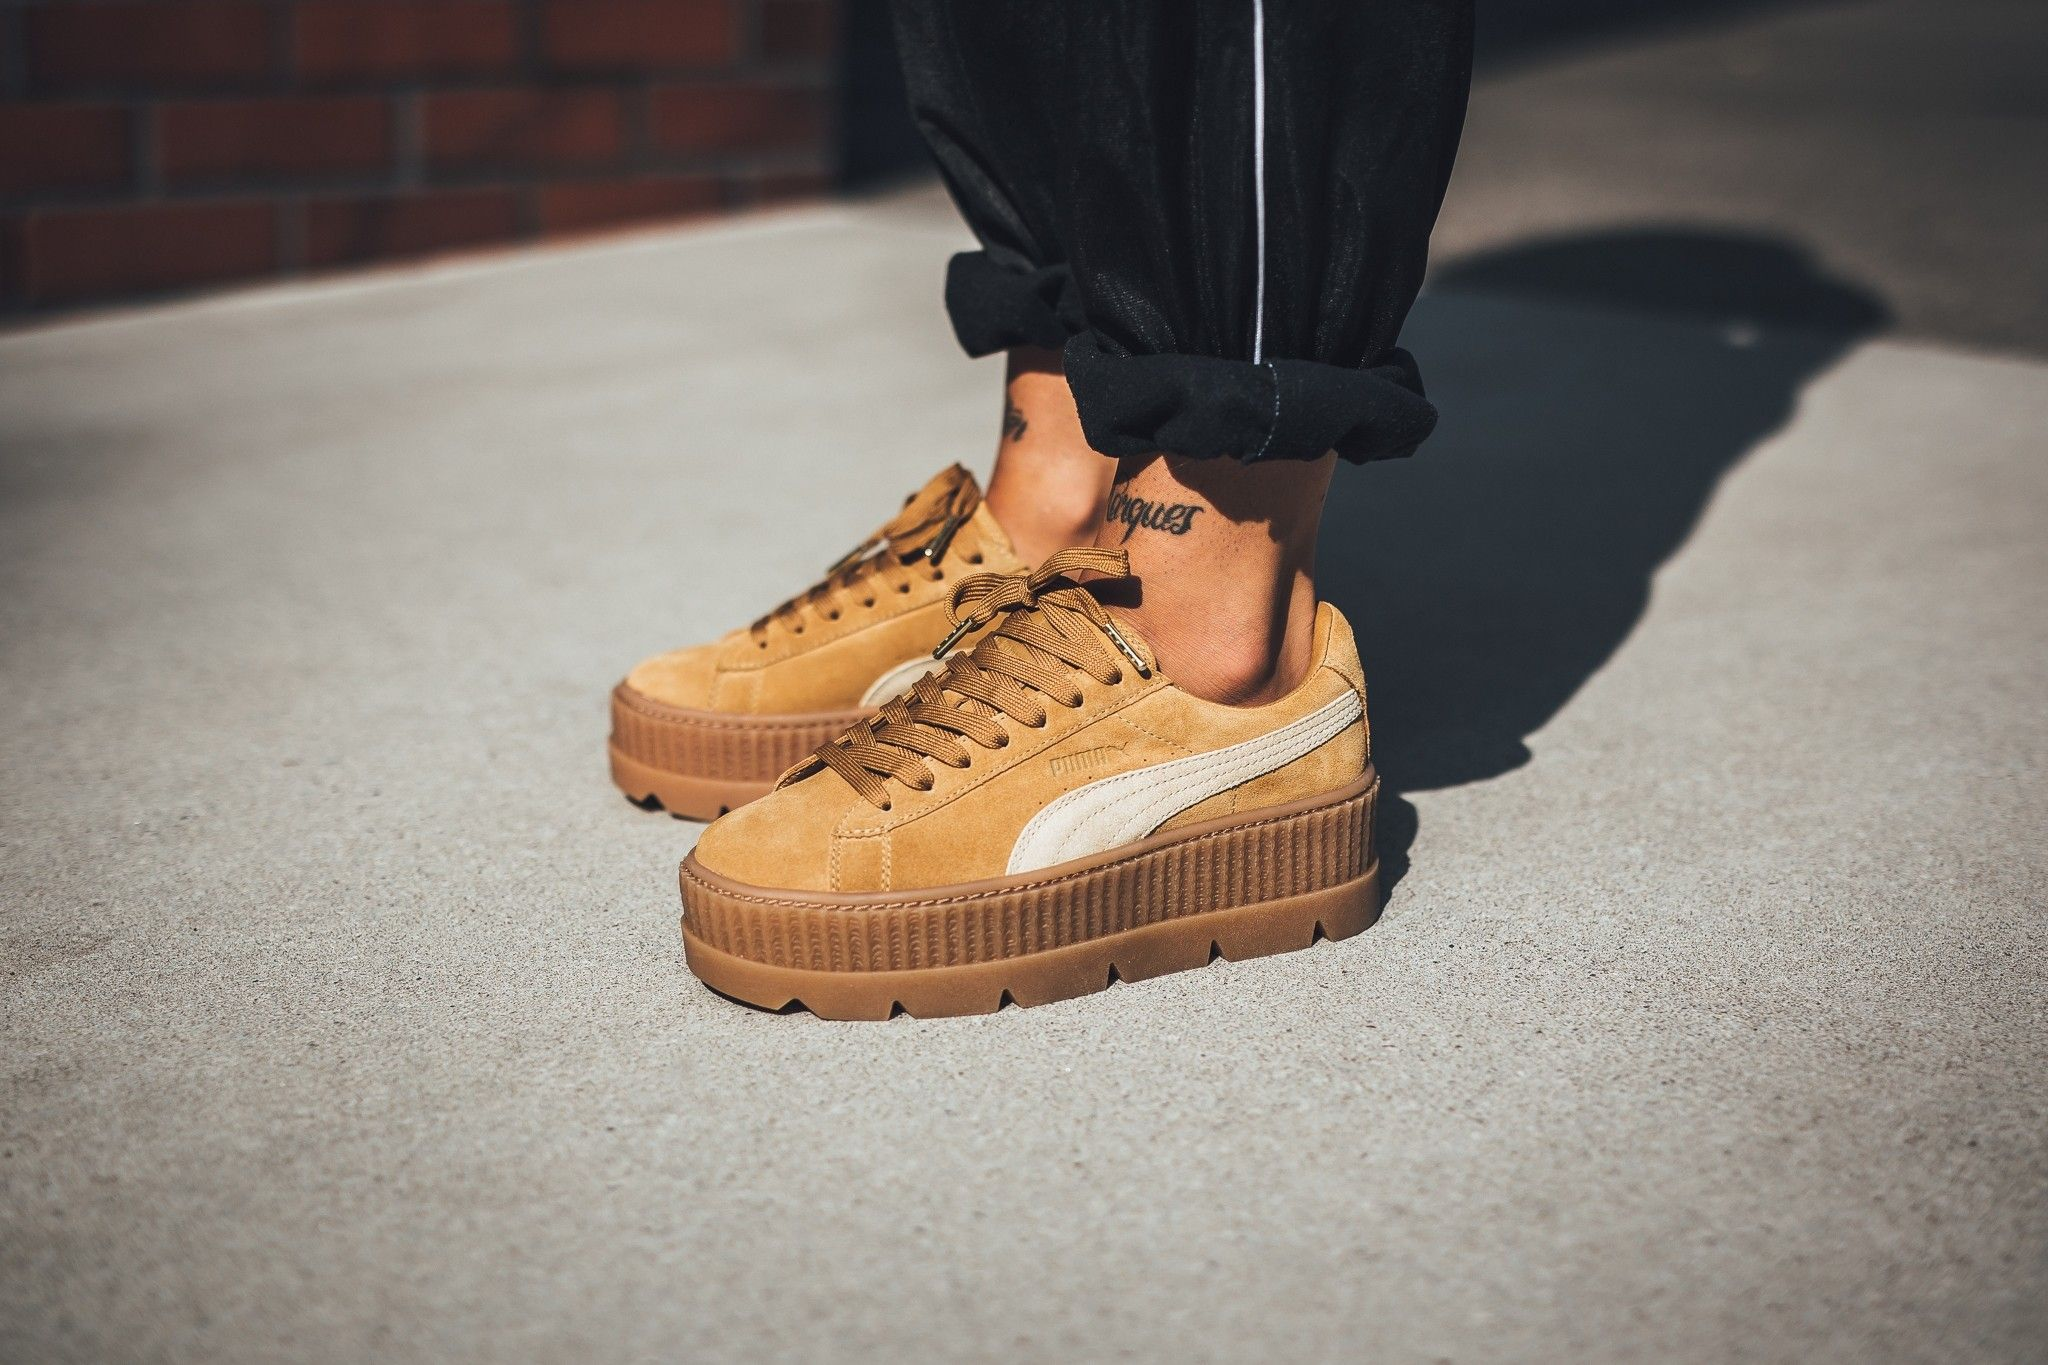 release date bd3b3 1cc07 puma x rihanna cleated creeper 8/31/17 | Sneakers | Suede ...